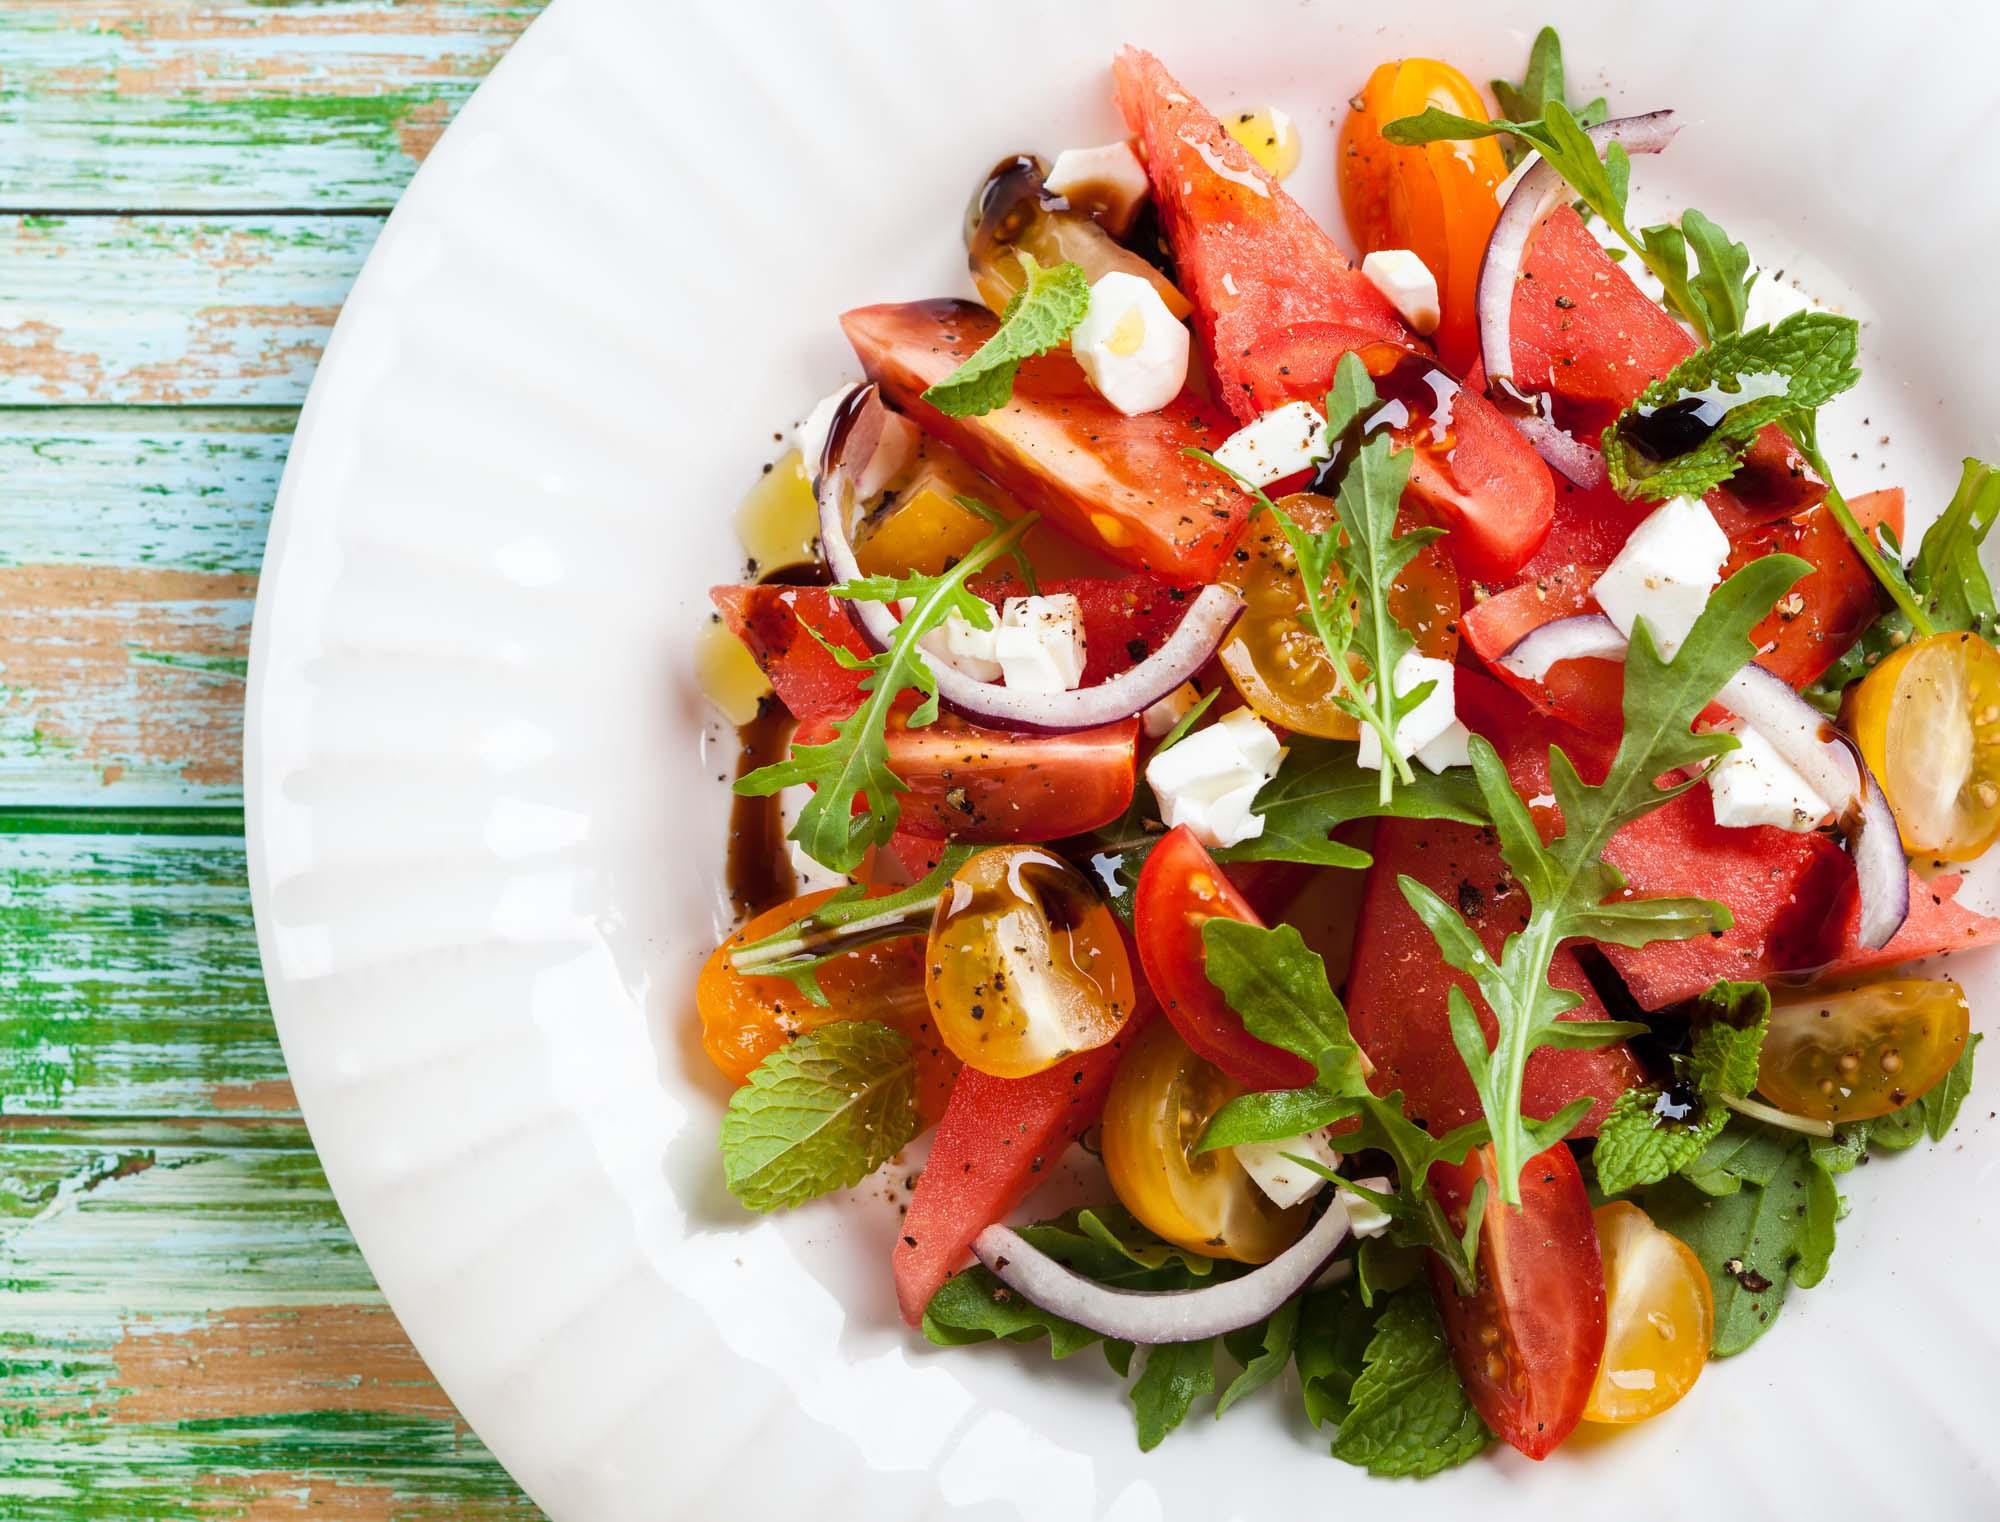 Vandmelonsalat - Salat af vandmelon, rødløg og tomater